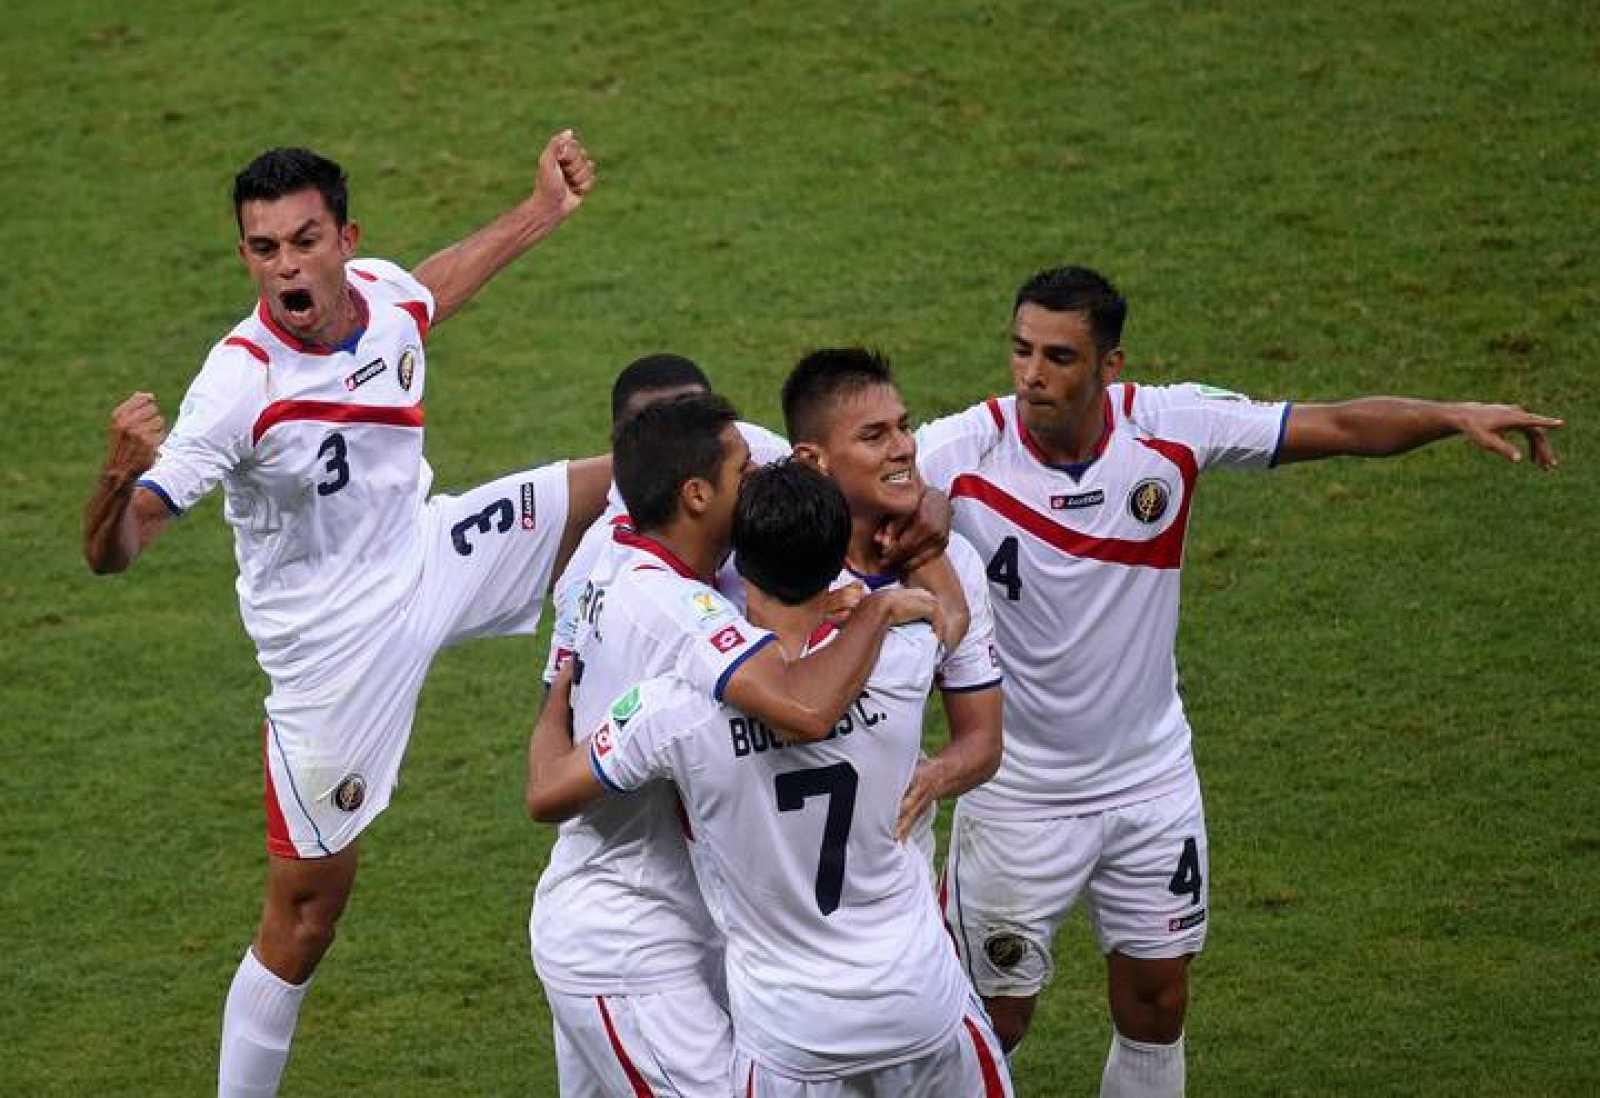 Duarte celebra con sus compañeros el segundo gol de Costa Rica frente a Uruguay.